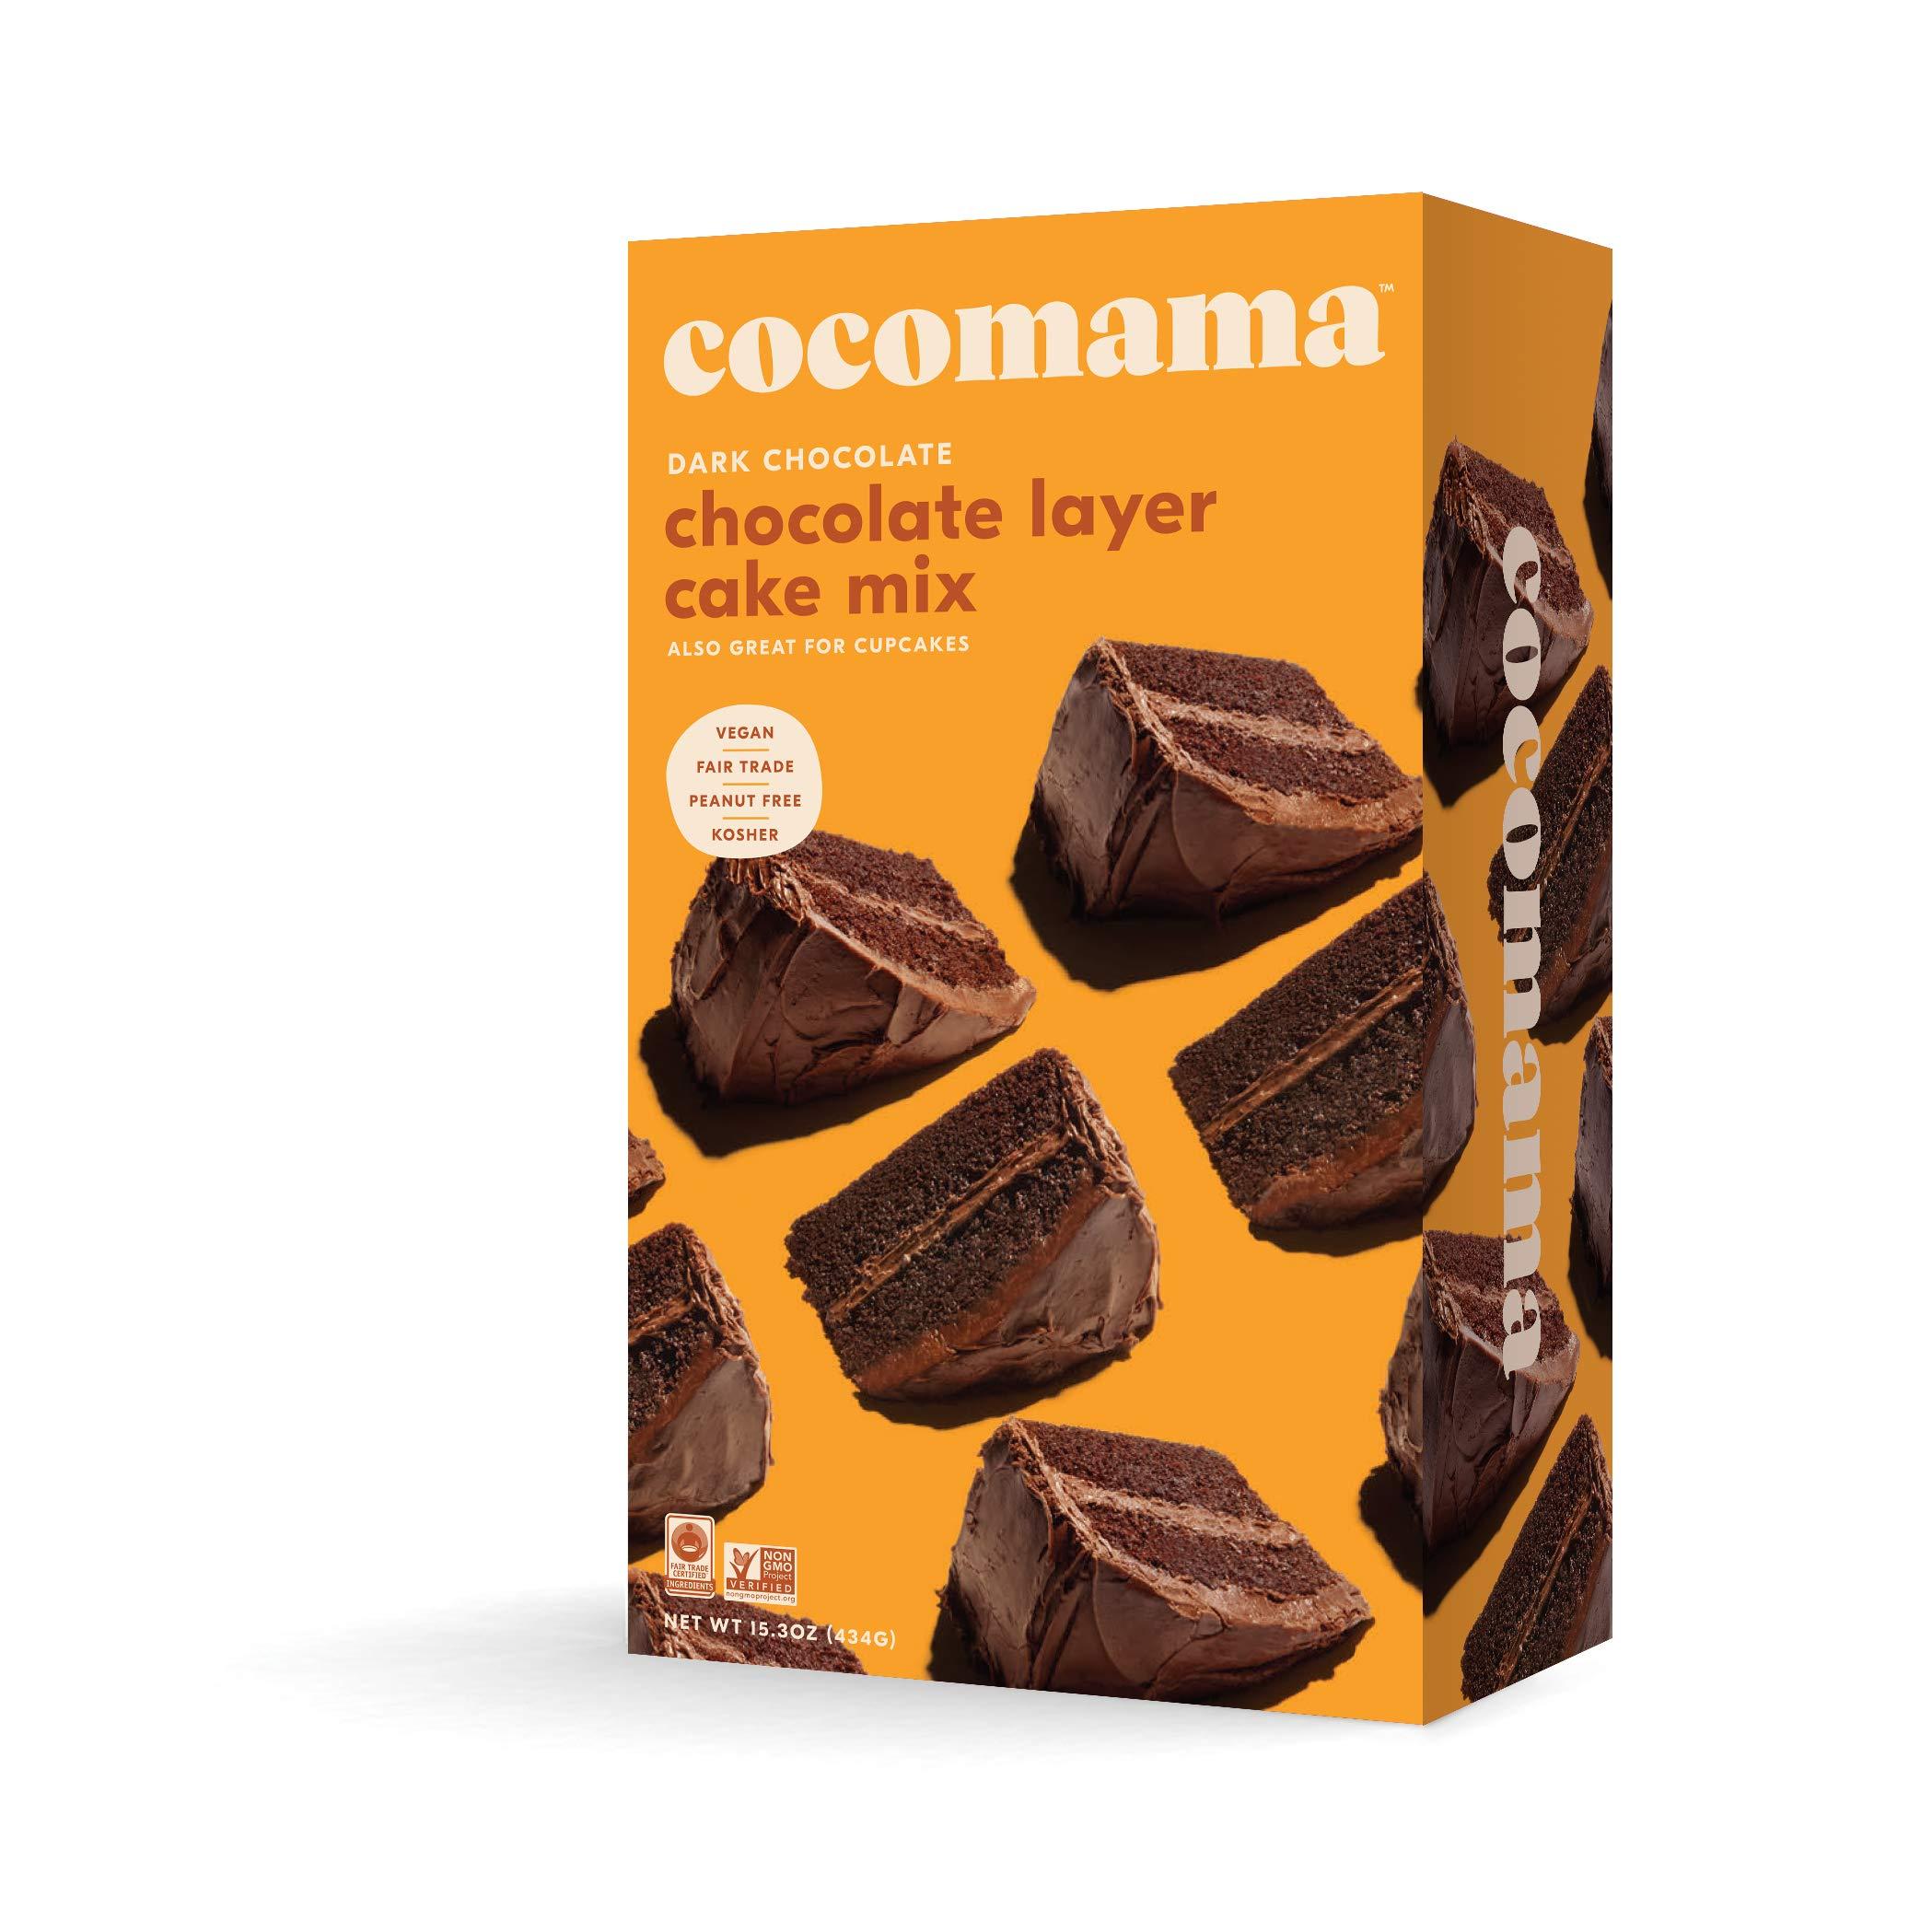 Cocomama Dark Chocolate Layer Cake Mix - Vegan Chocolate Baking Mix, Organic Fair Trade Cocoa Powder & Cane Sugar, Madagascar Vanilla Bean, Non GMO, Kosher, 15.3 oz